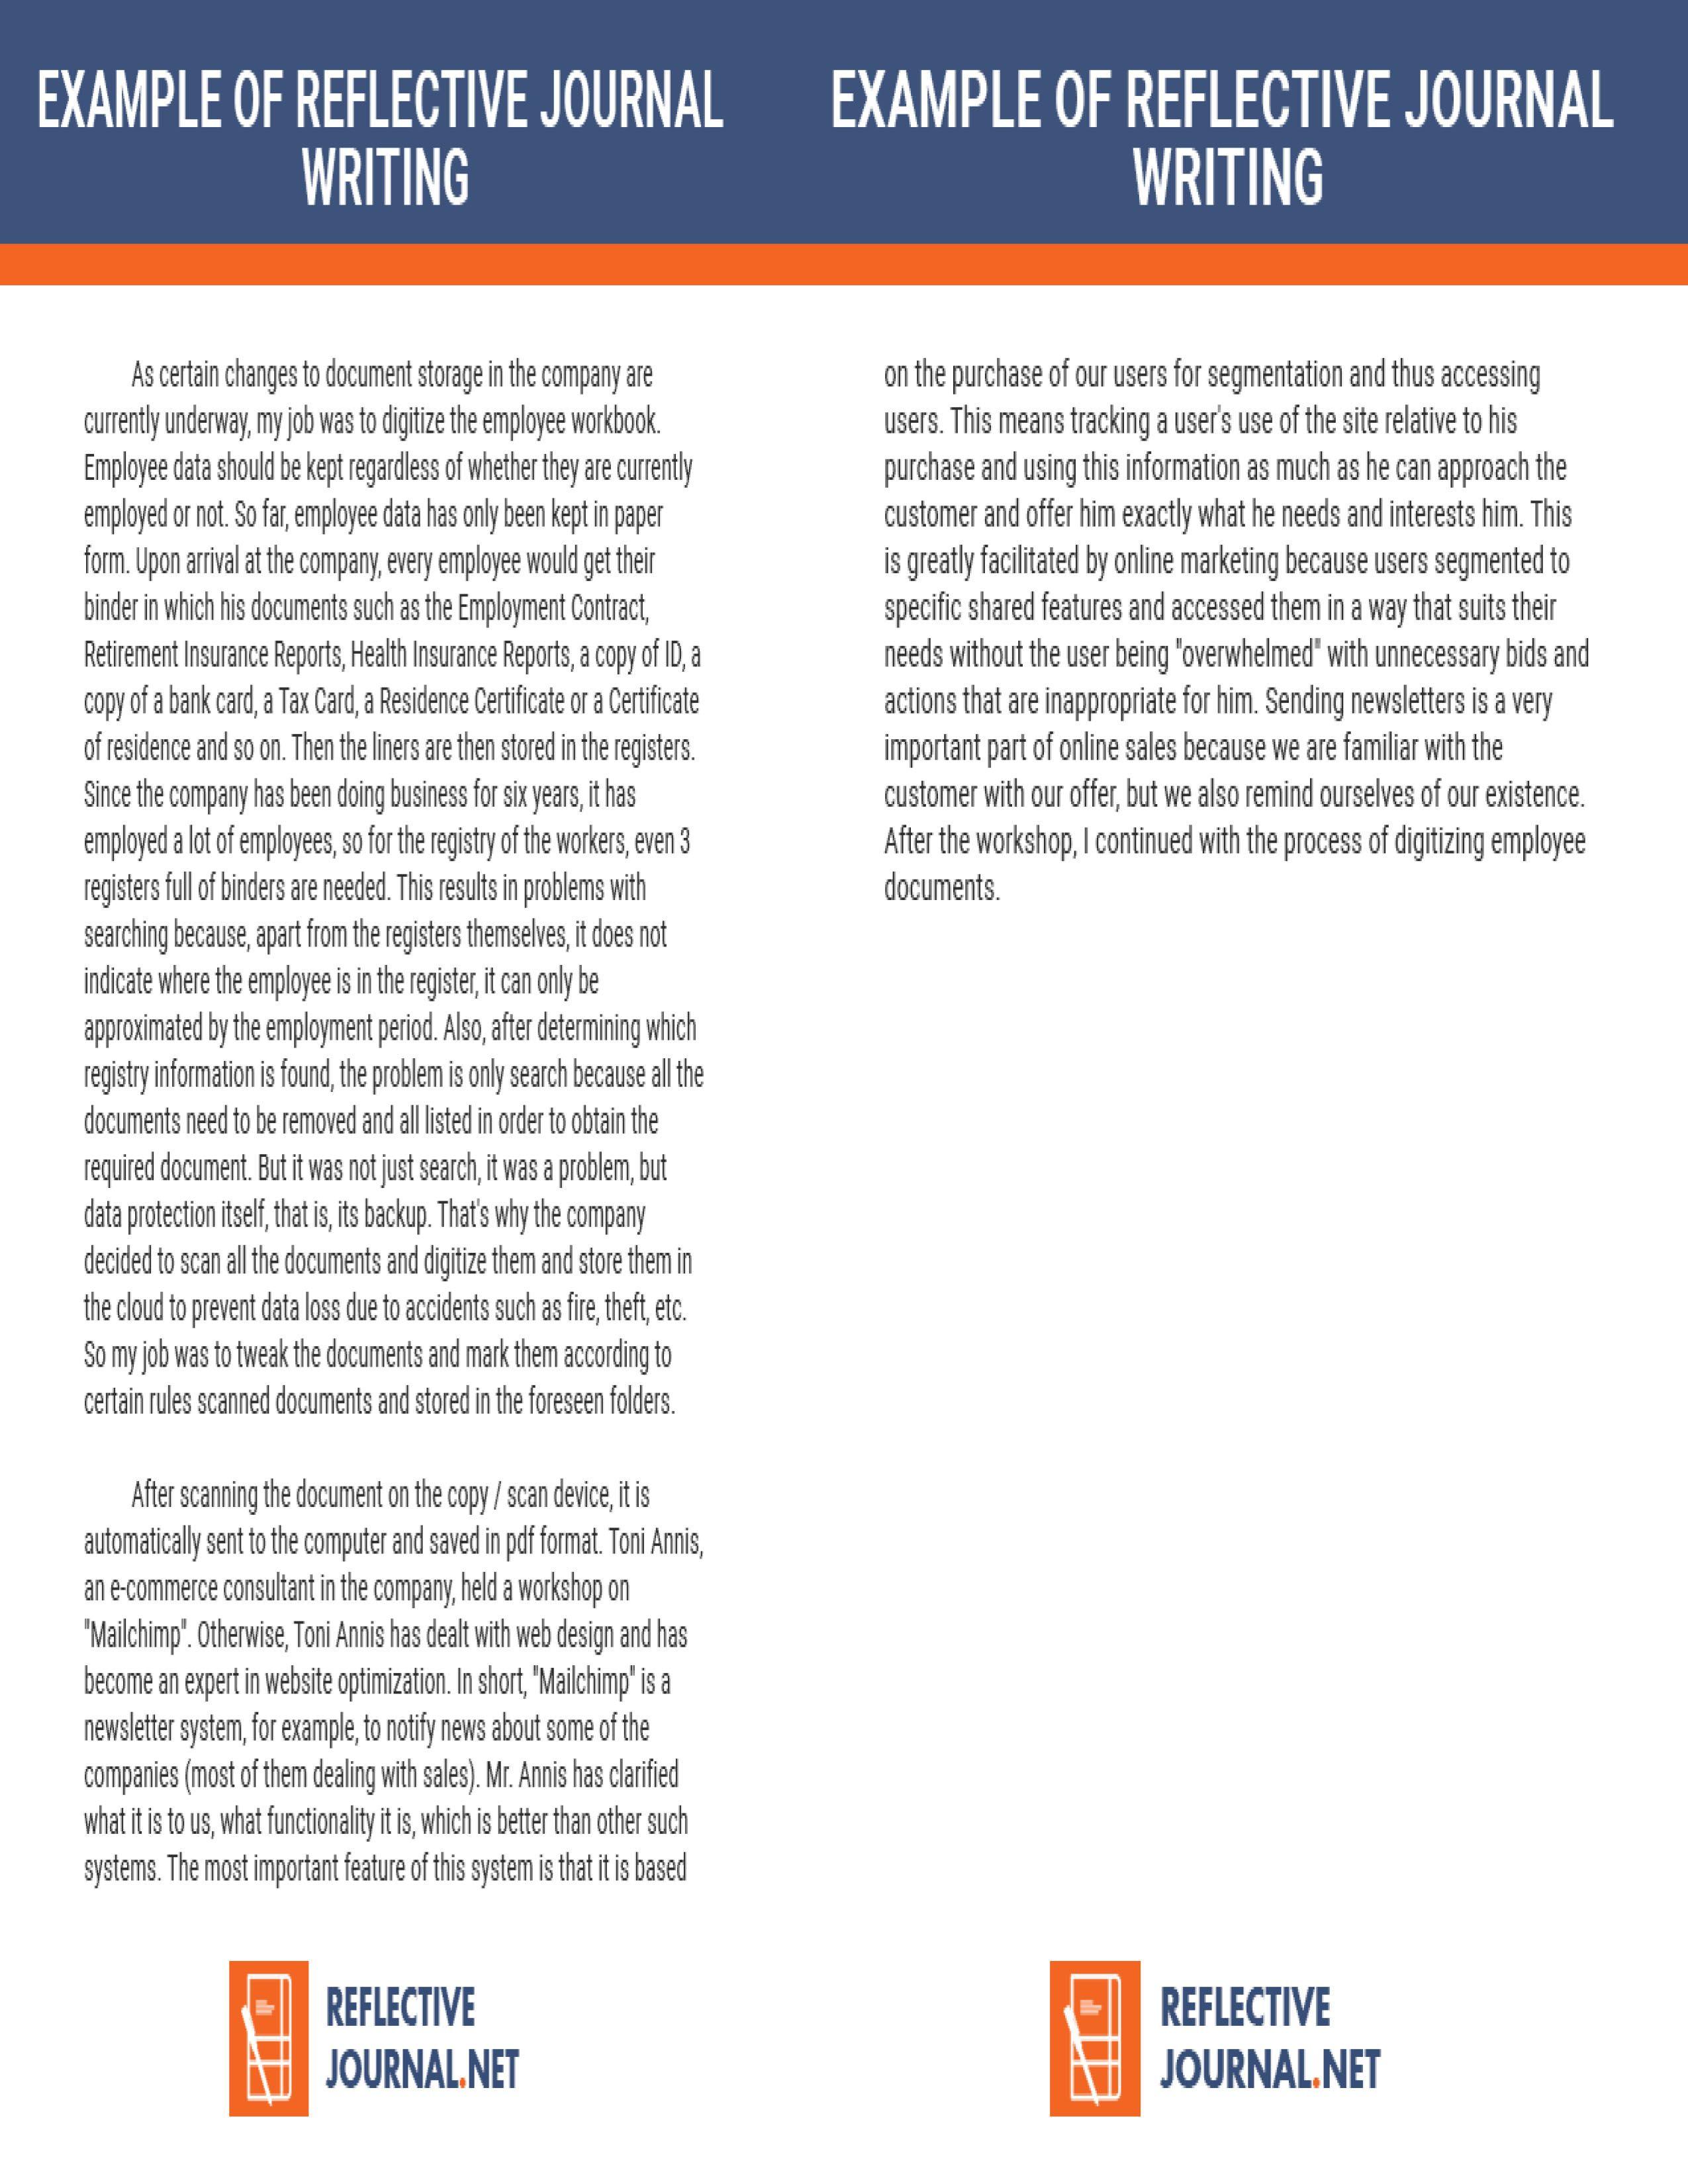 About business management essay